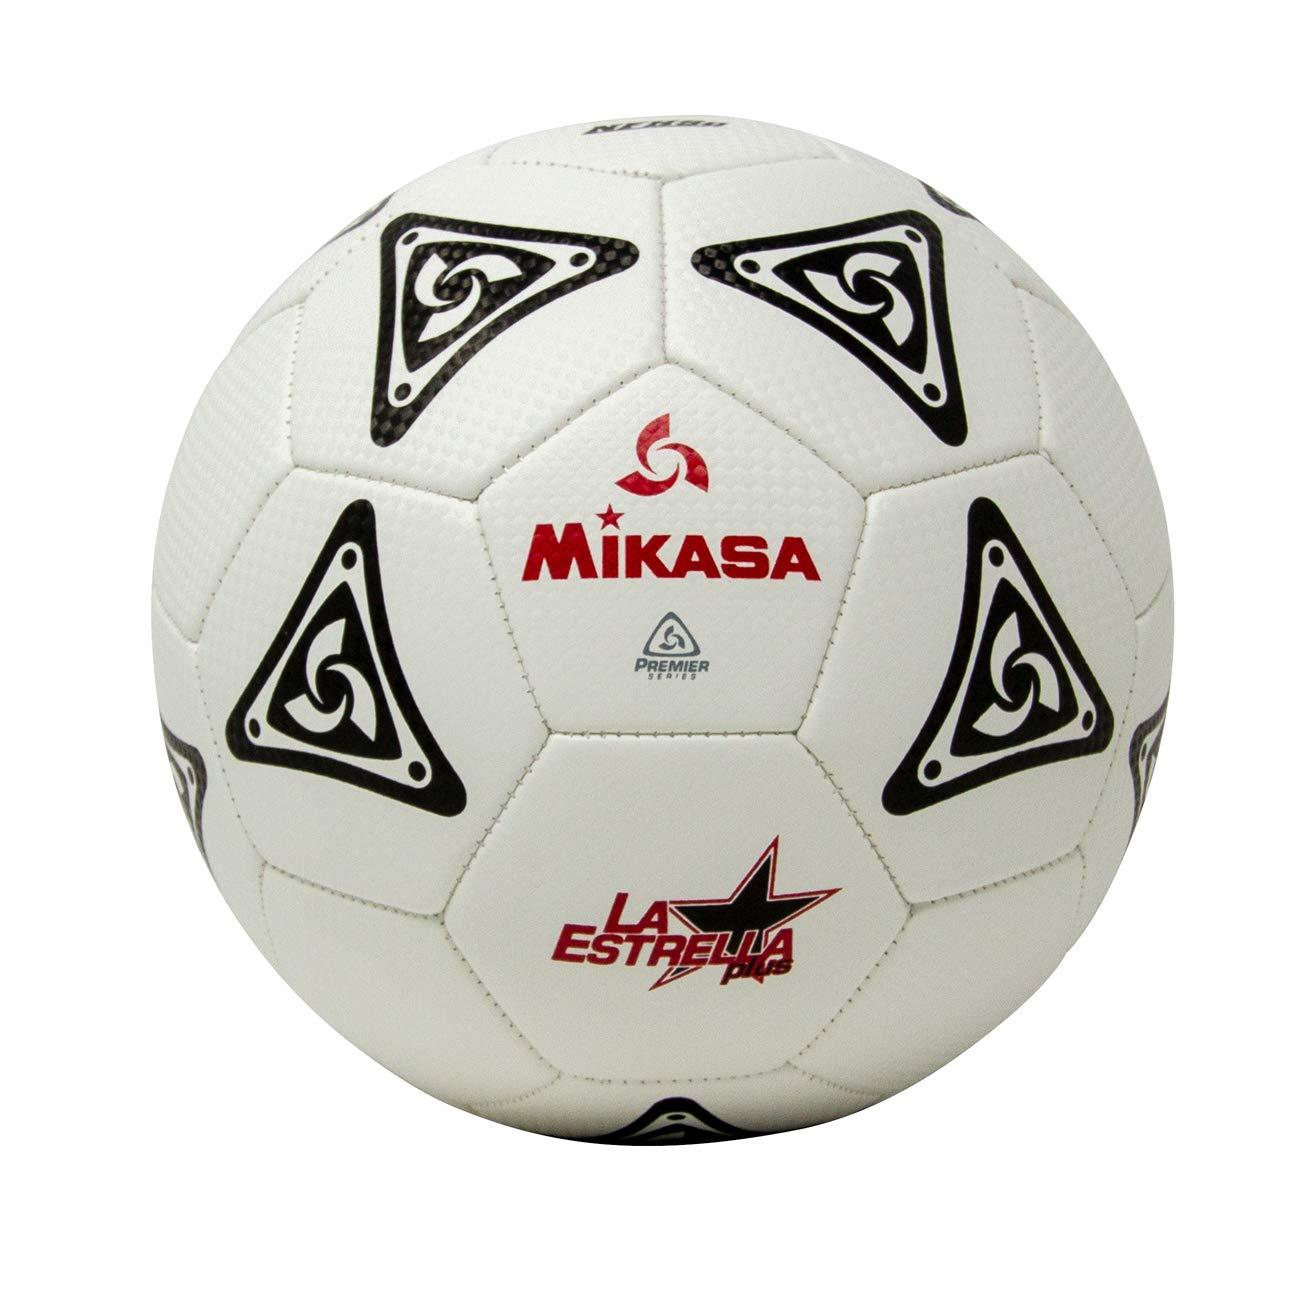 Mikasa LE50 la Estrella de balón de fútbol (tamaño 5), Unisex ...